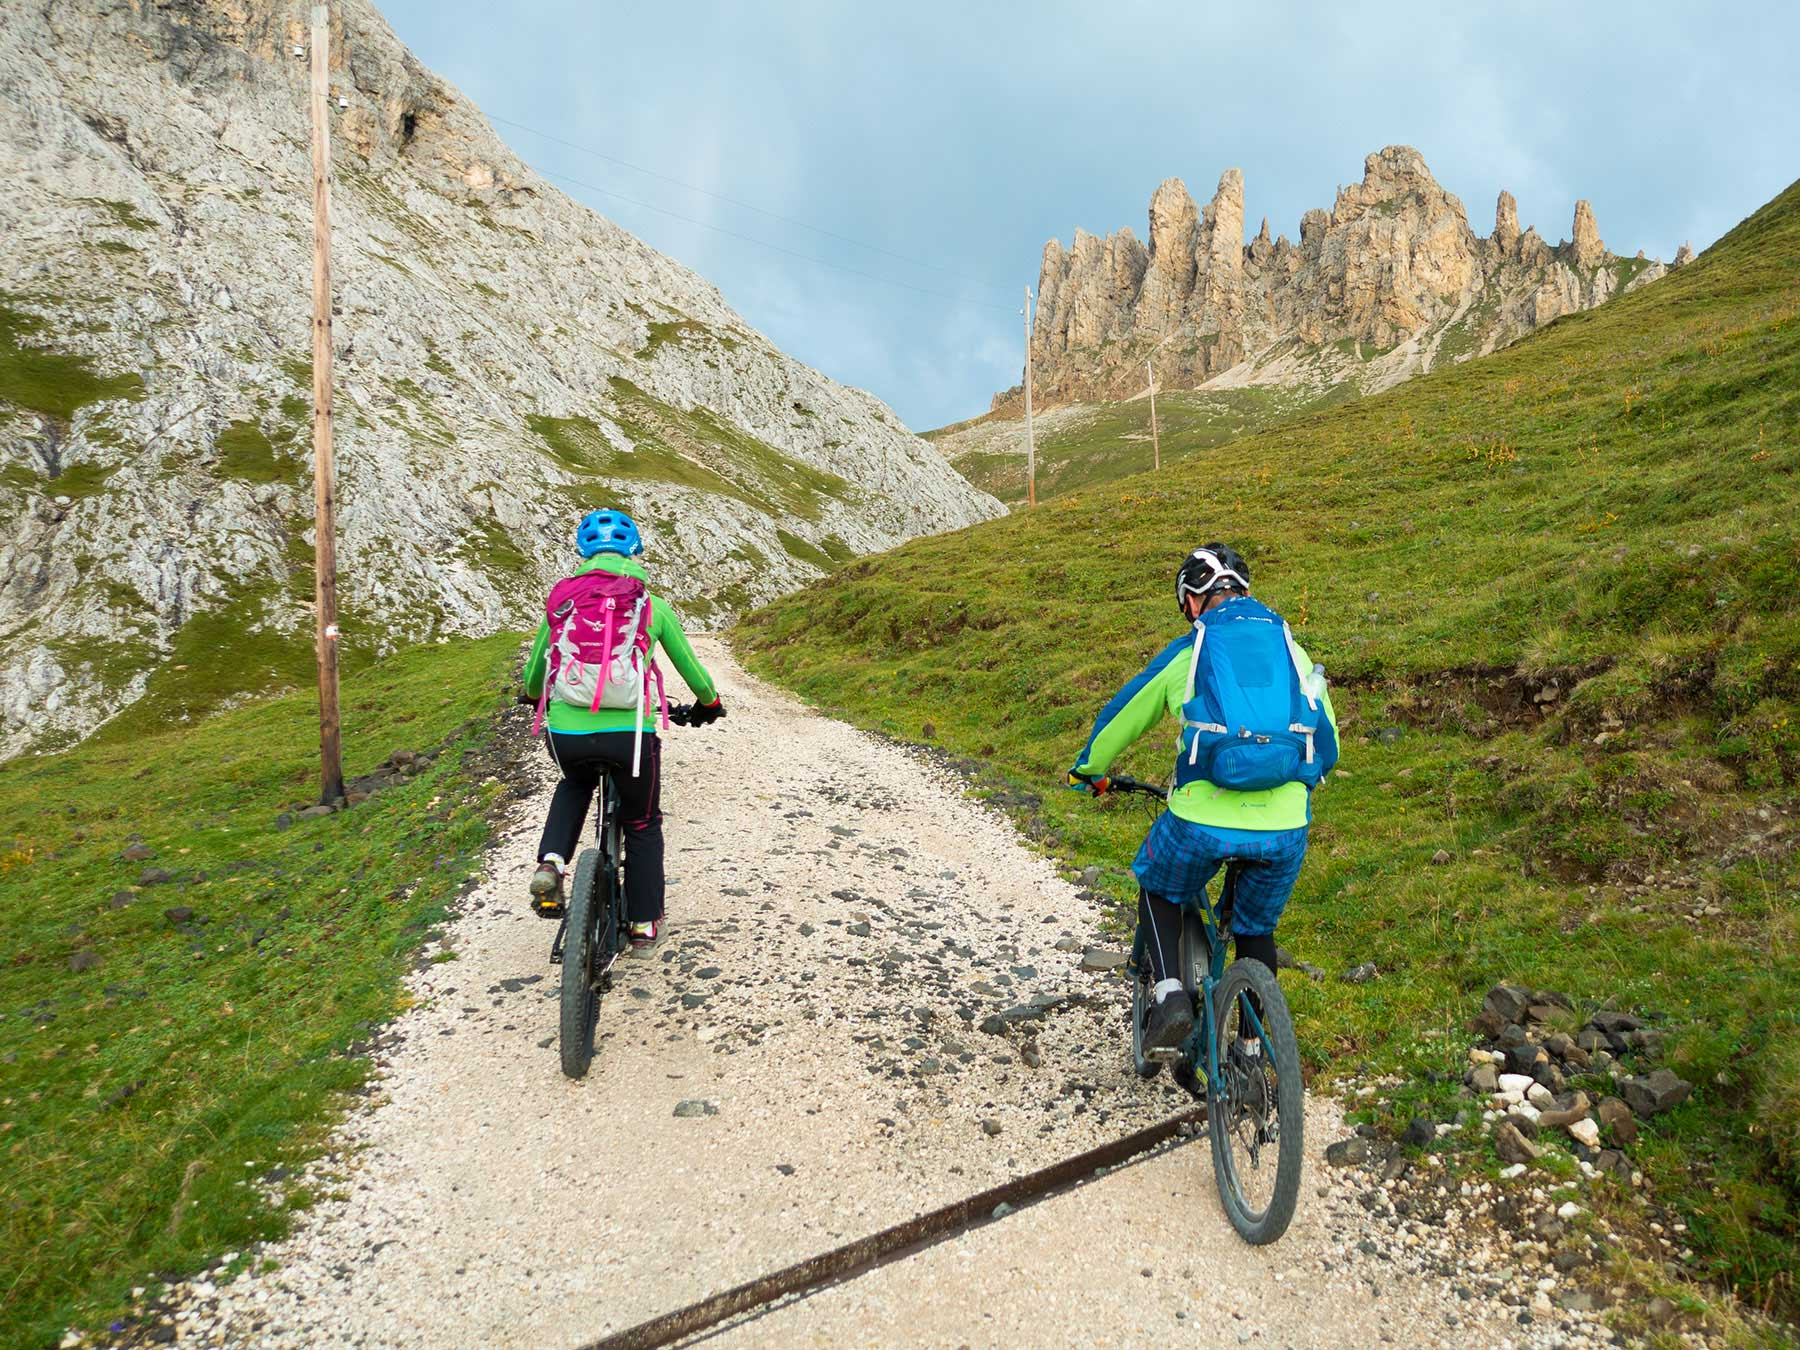 Val Duran mtb tour - alpe di Siusi / val di fassa